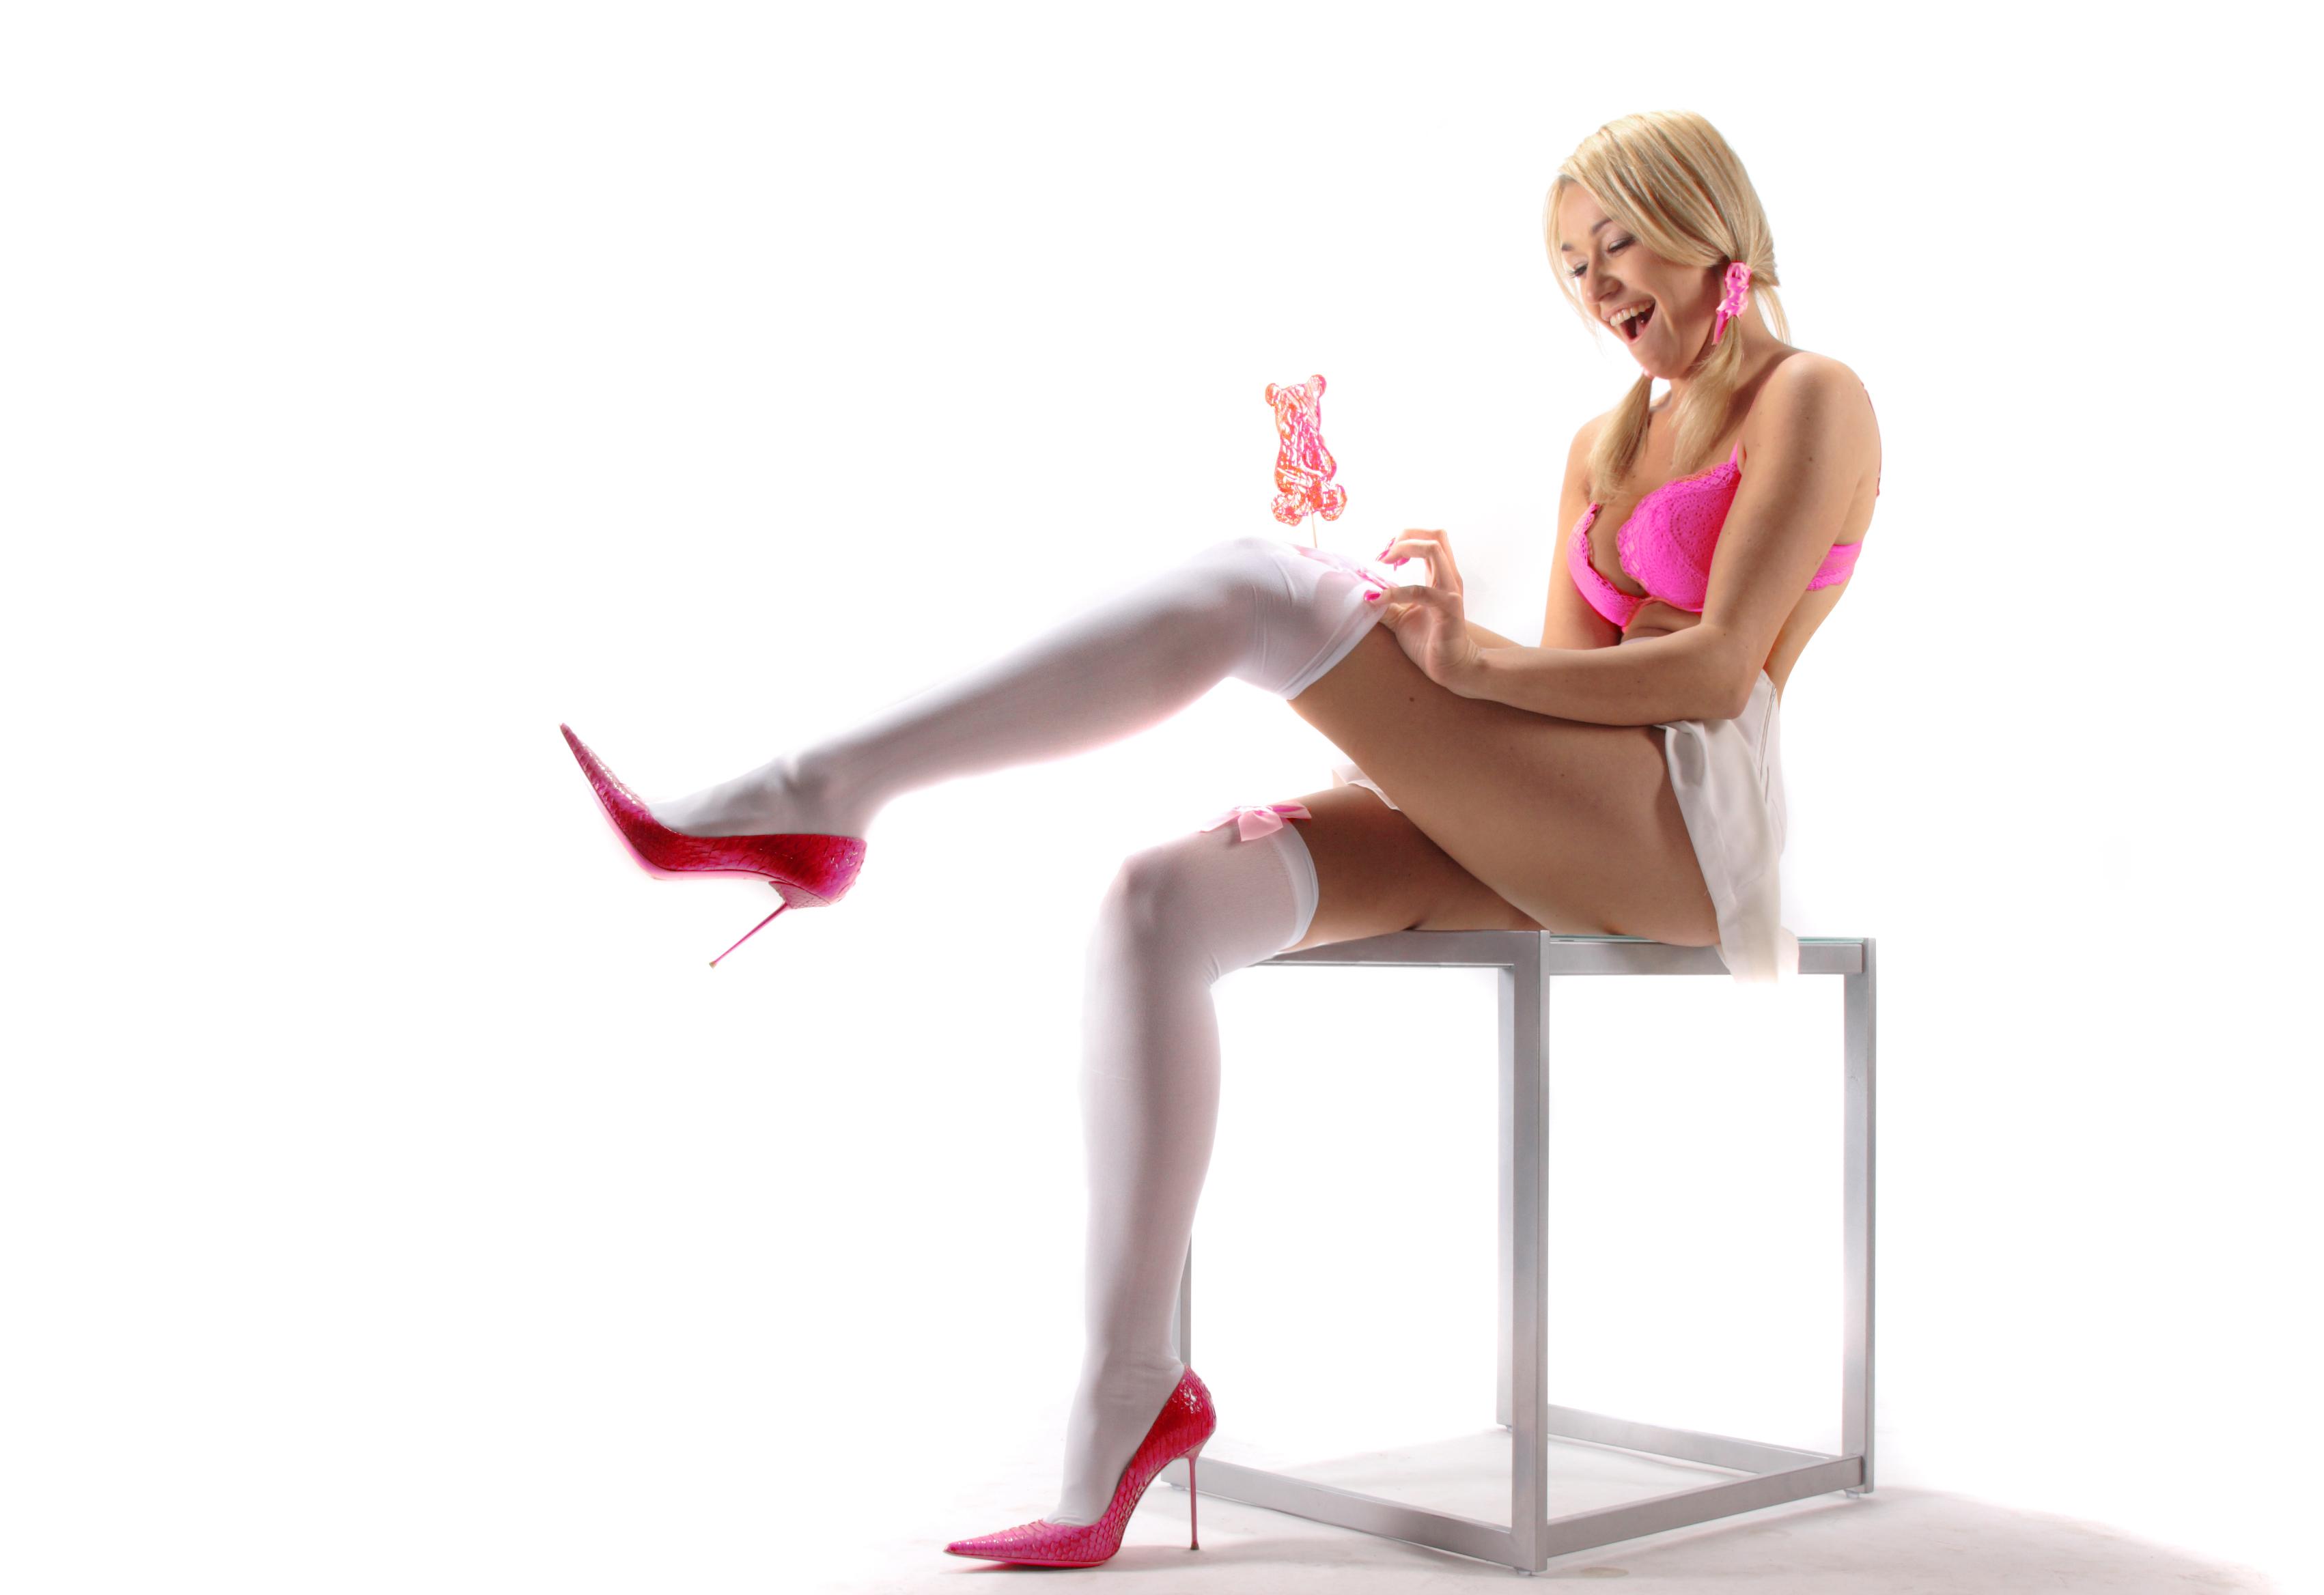 Girls titts girl fucked heels red